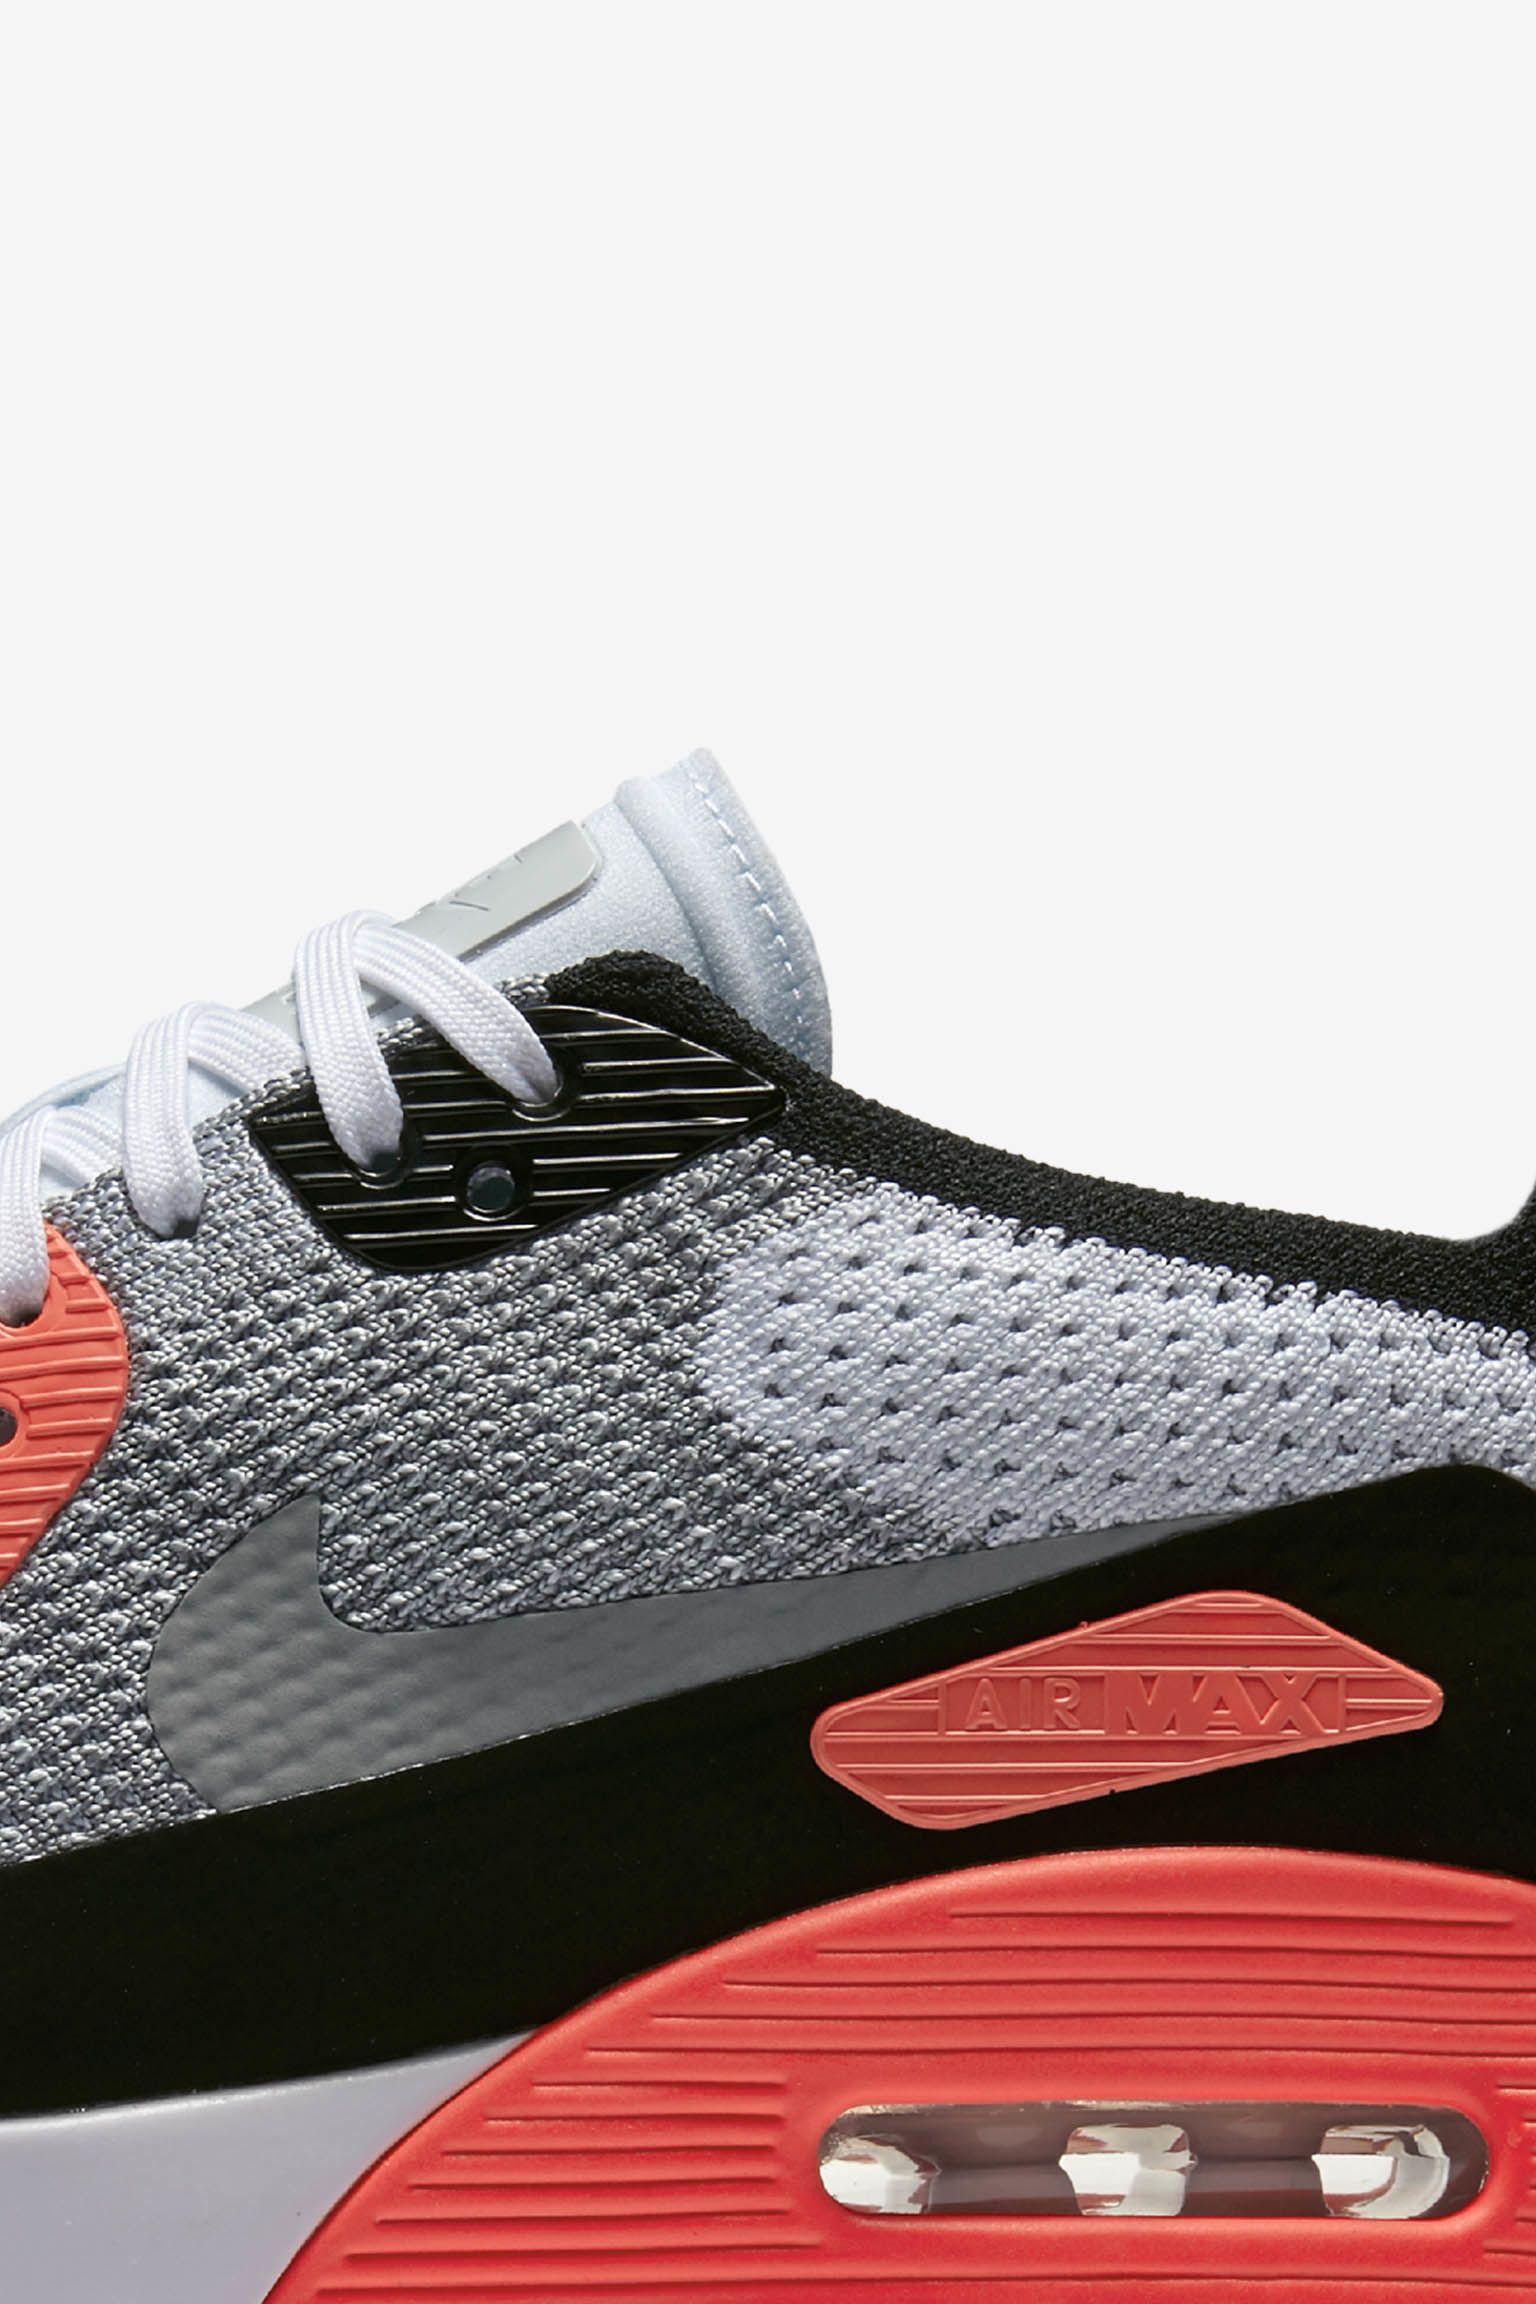 Women's Nike Air Max 90 Ultra 2.0 Flyknit 'White & Bright Crimson'